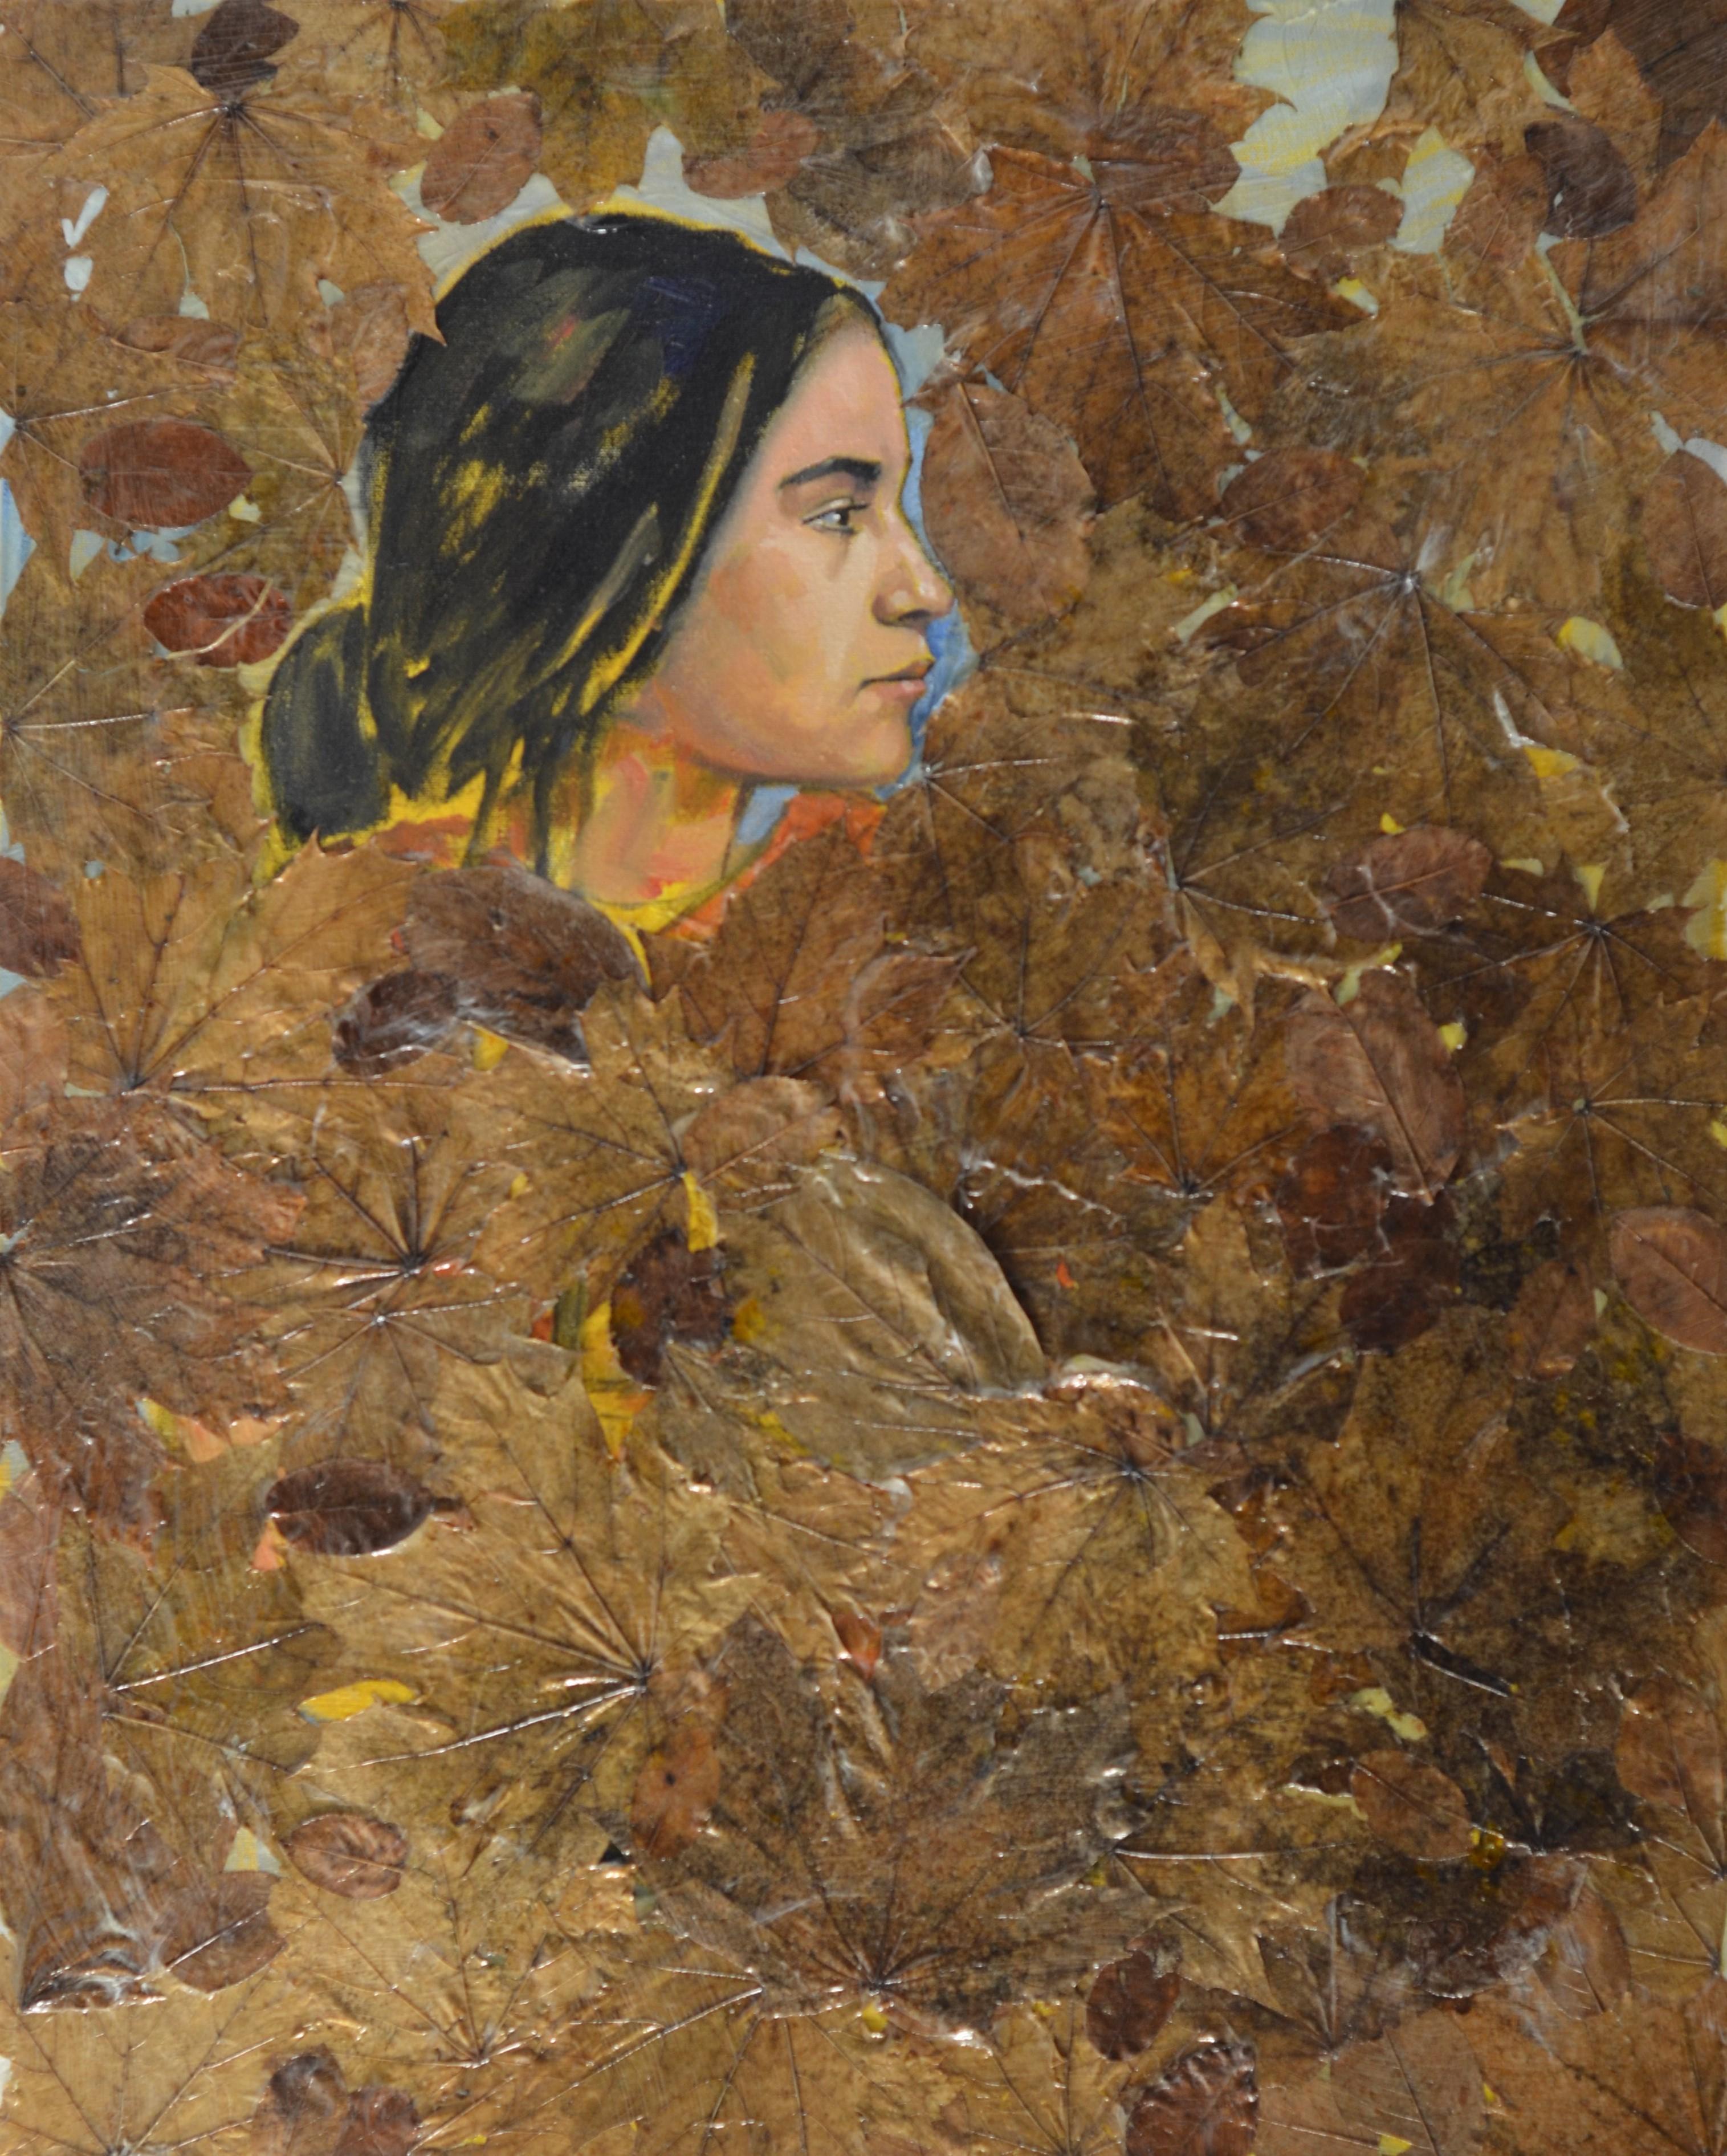 Rana acrylic medium, tempera and leaves on canvas 30 x 24 Inch 2019